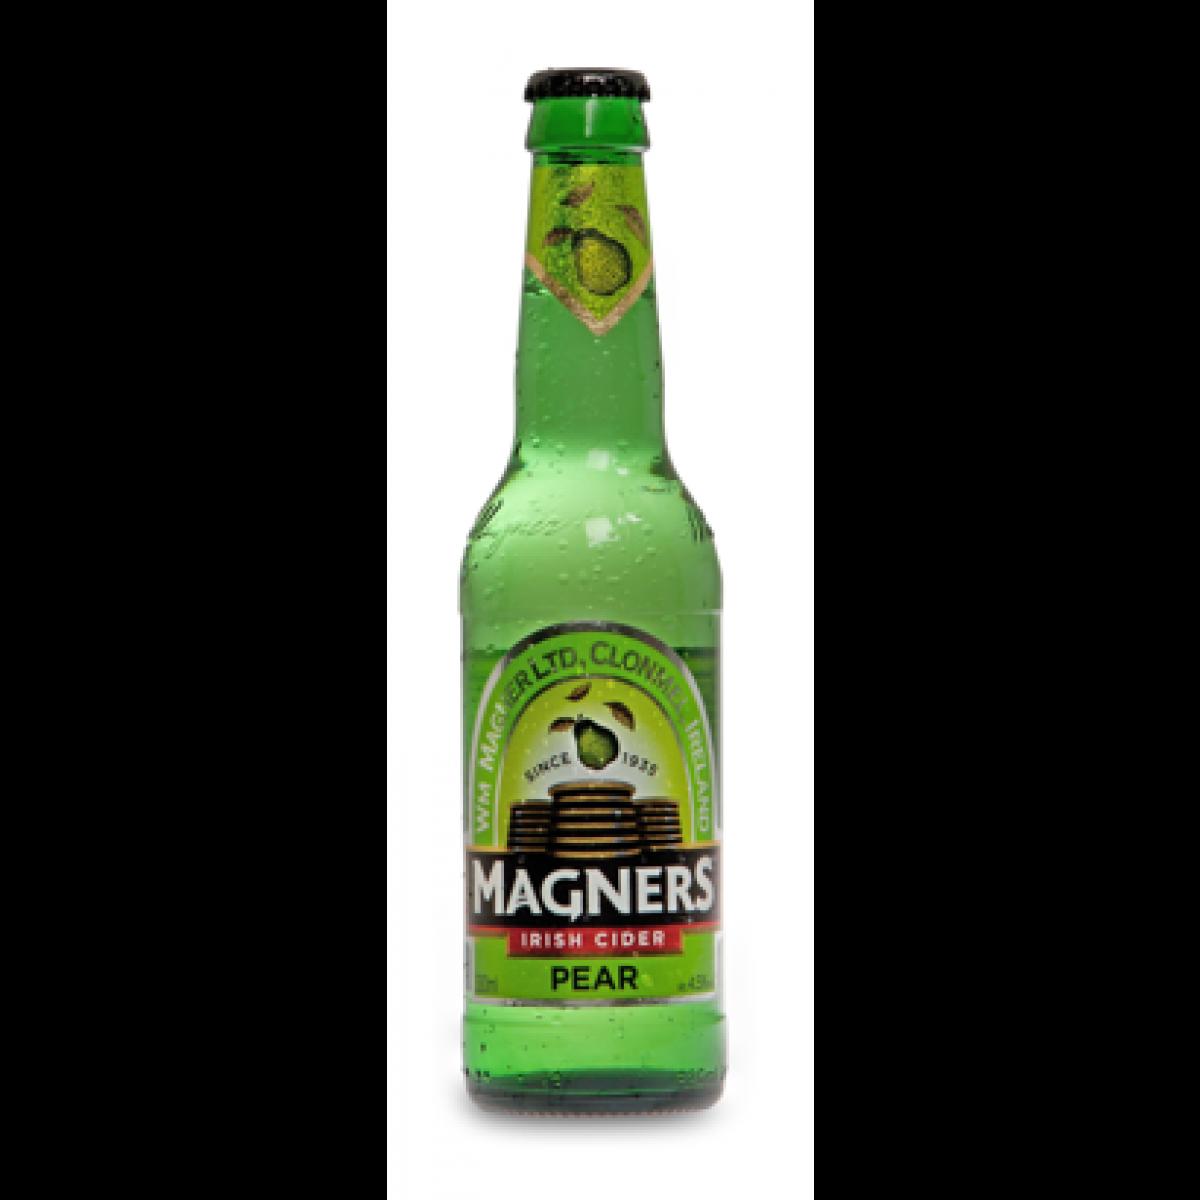 Irish Cider Pear